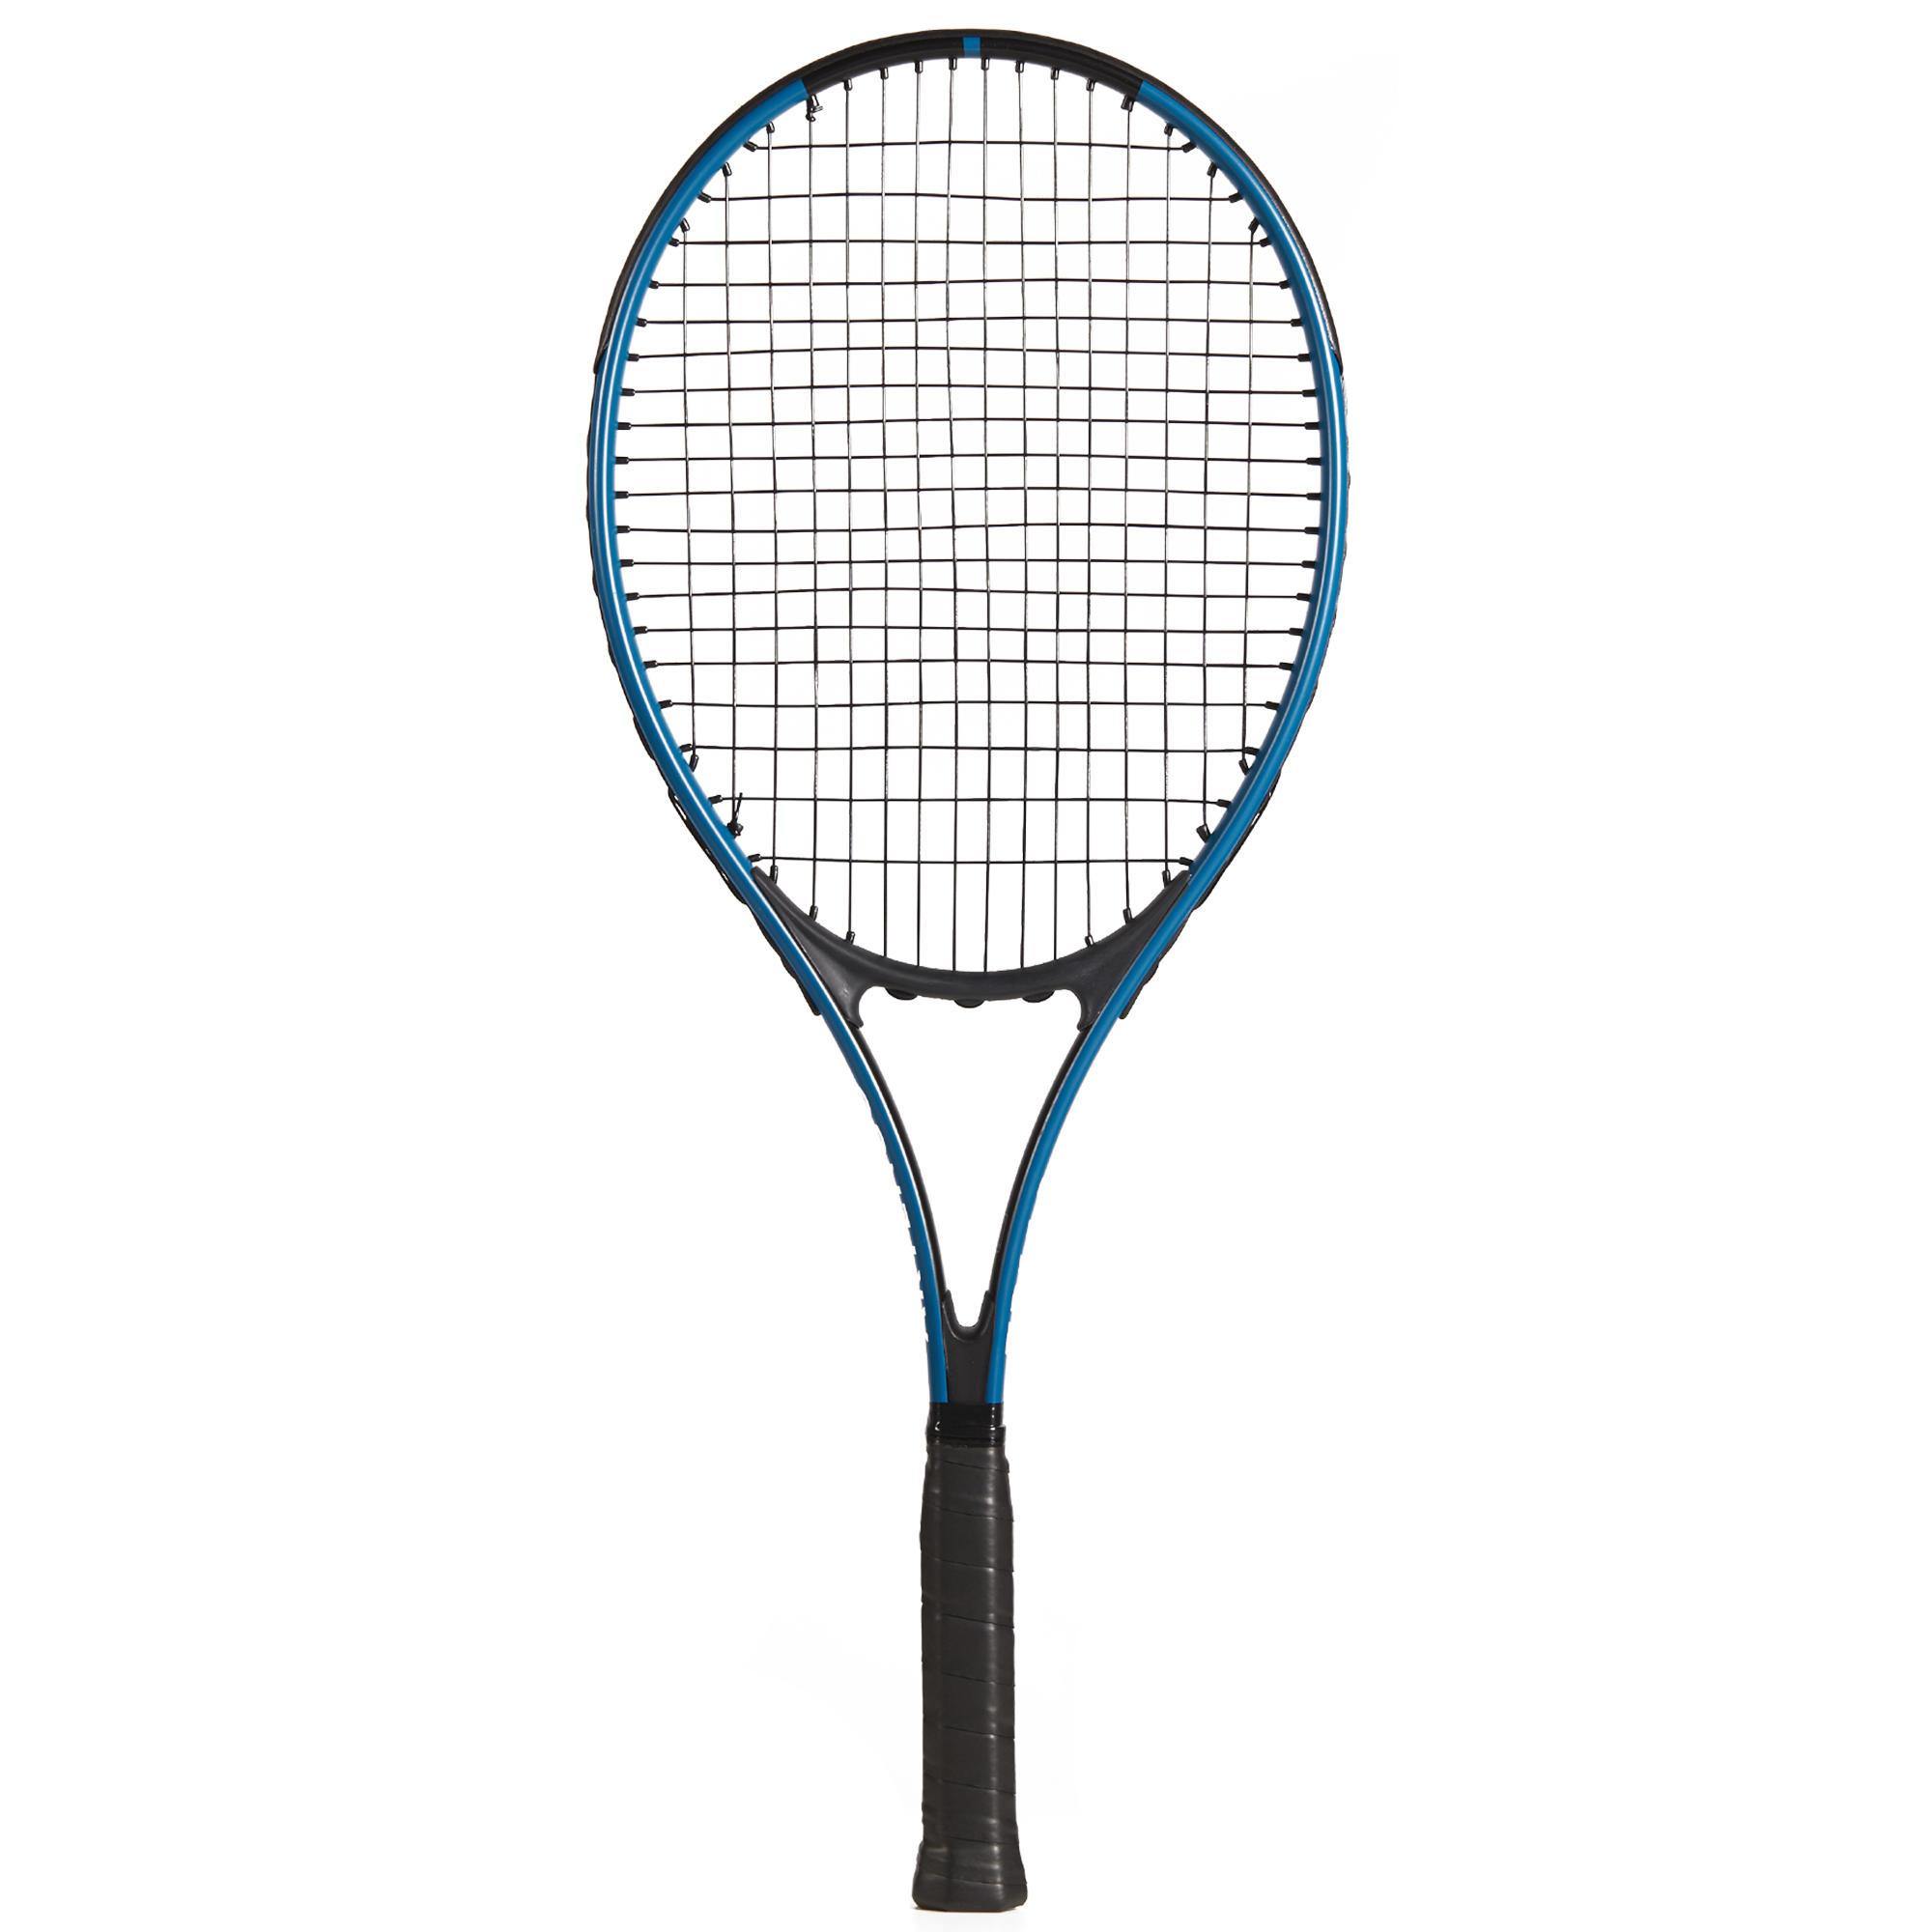 Rachetă Tenis TR110 Adulți imagine